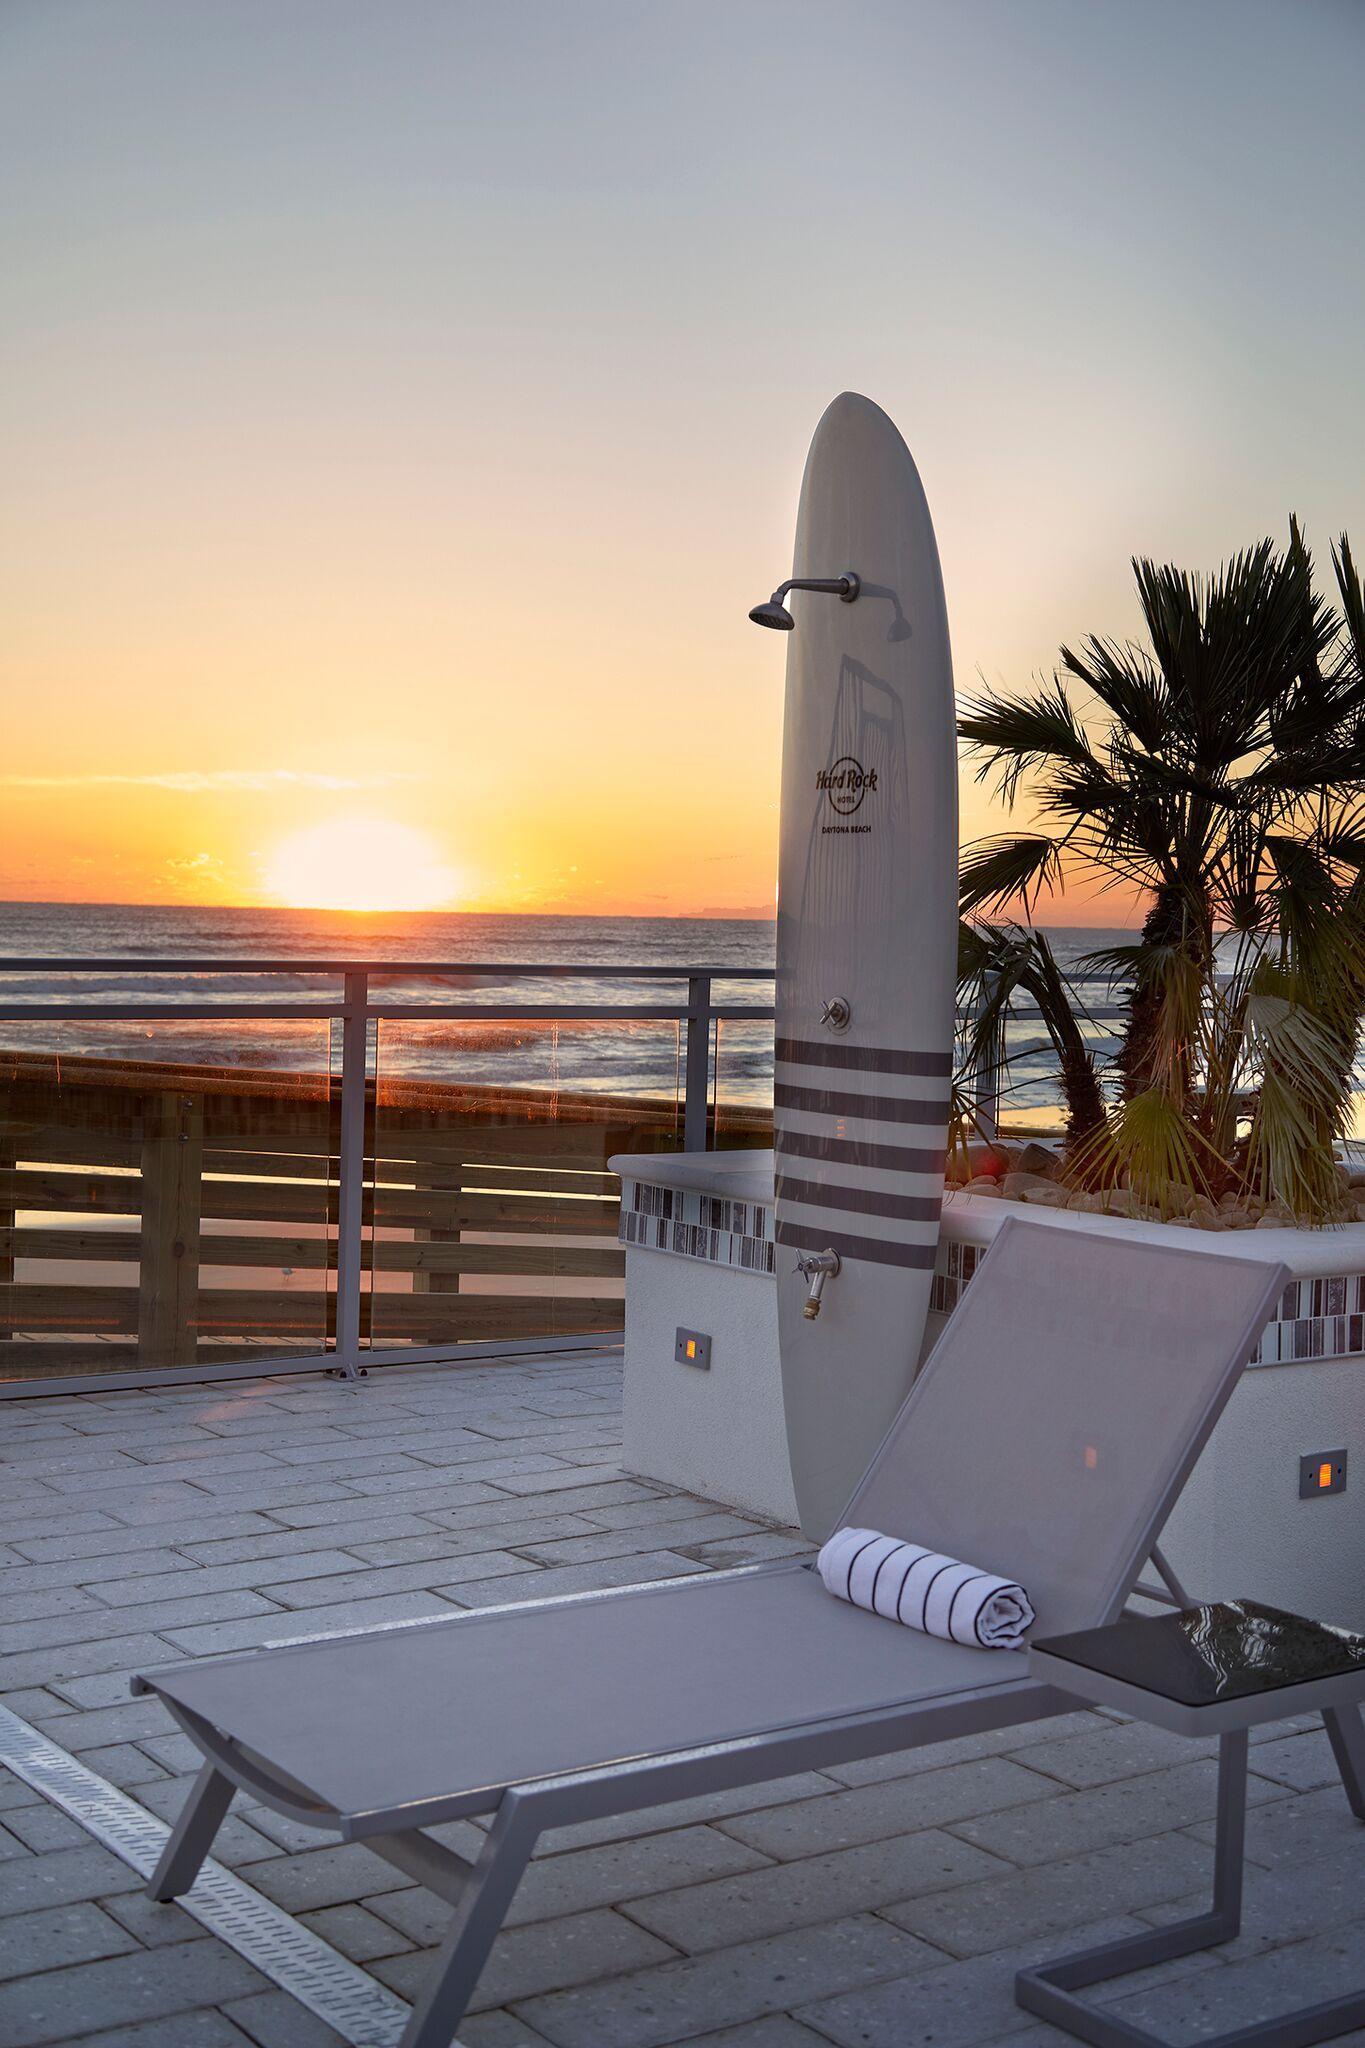 surfboard_1.jpeg